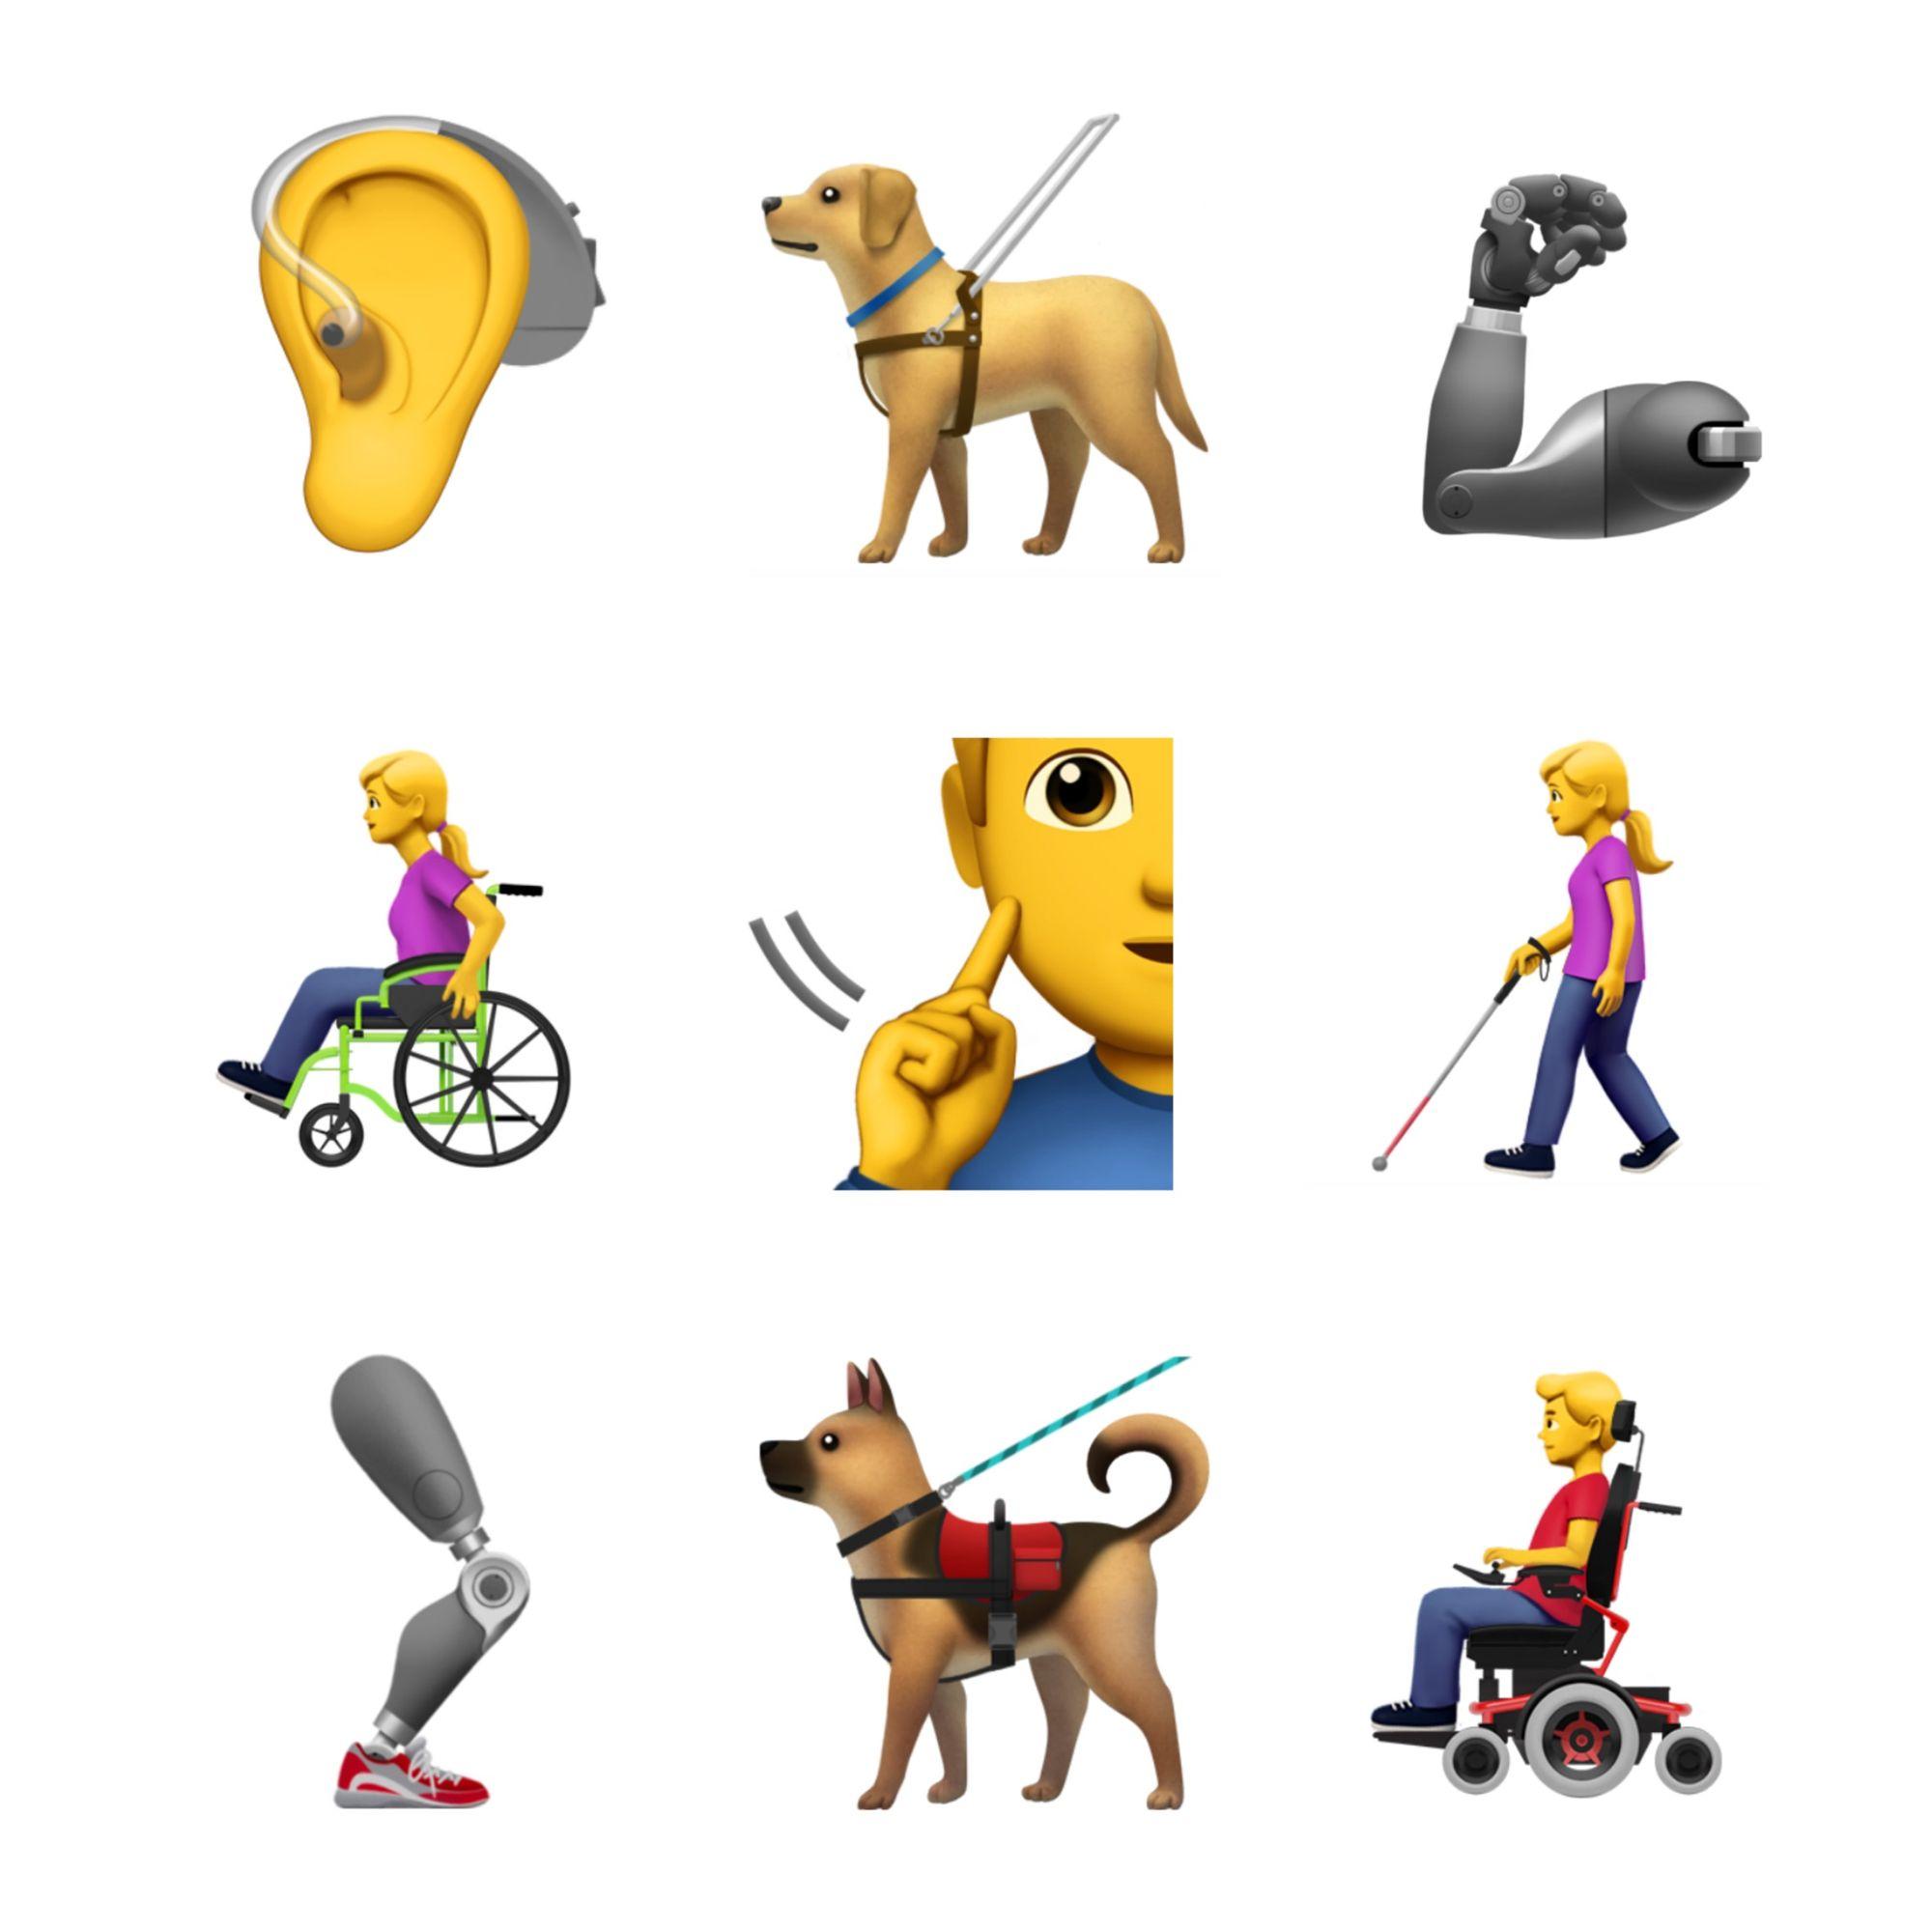 Apple 及 Google 在 World Emoji Day 这天表现出了对残疾人士的关注,未来emoji更多元化 6